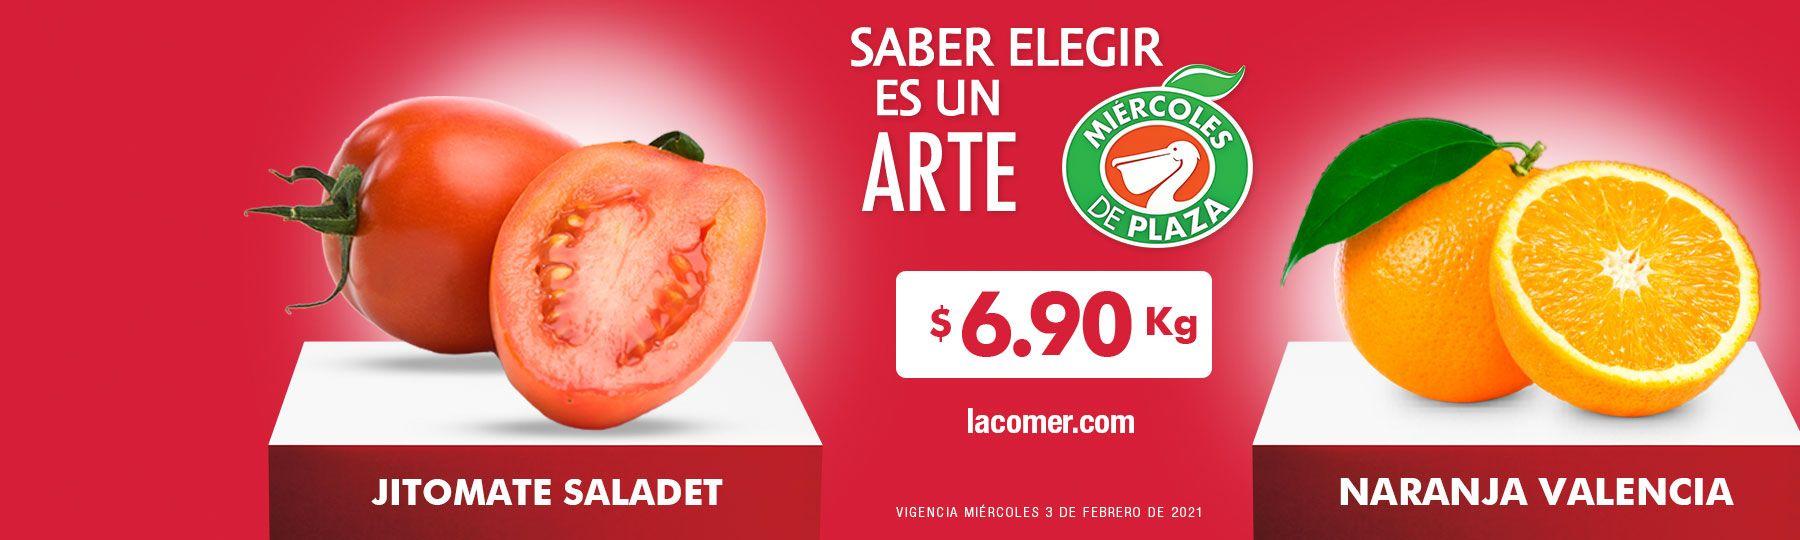 La Comer y Fresko: Miércoles de Plaza 3 de Febrero: Jitomate ó Naranja $6.90 kg... Manzana Gala ó Durazno $36.90 kg.